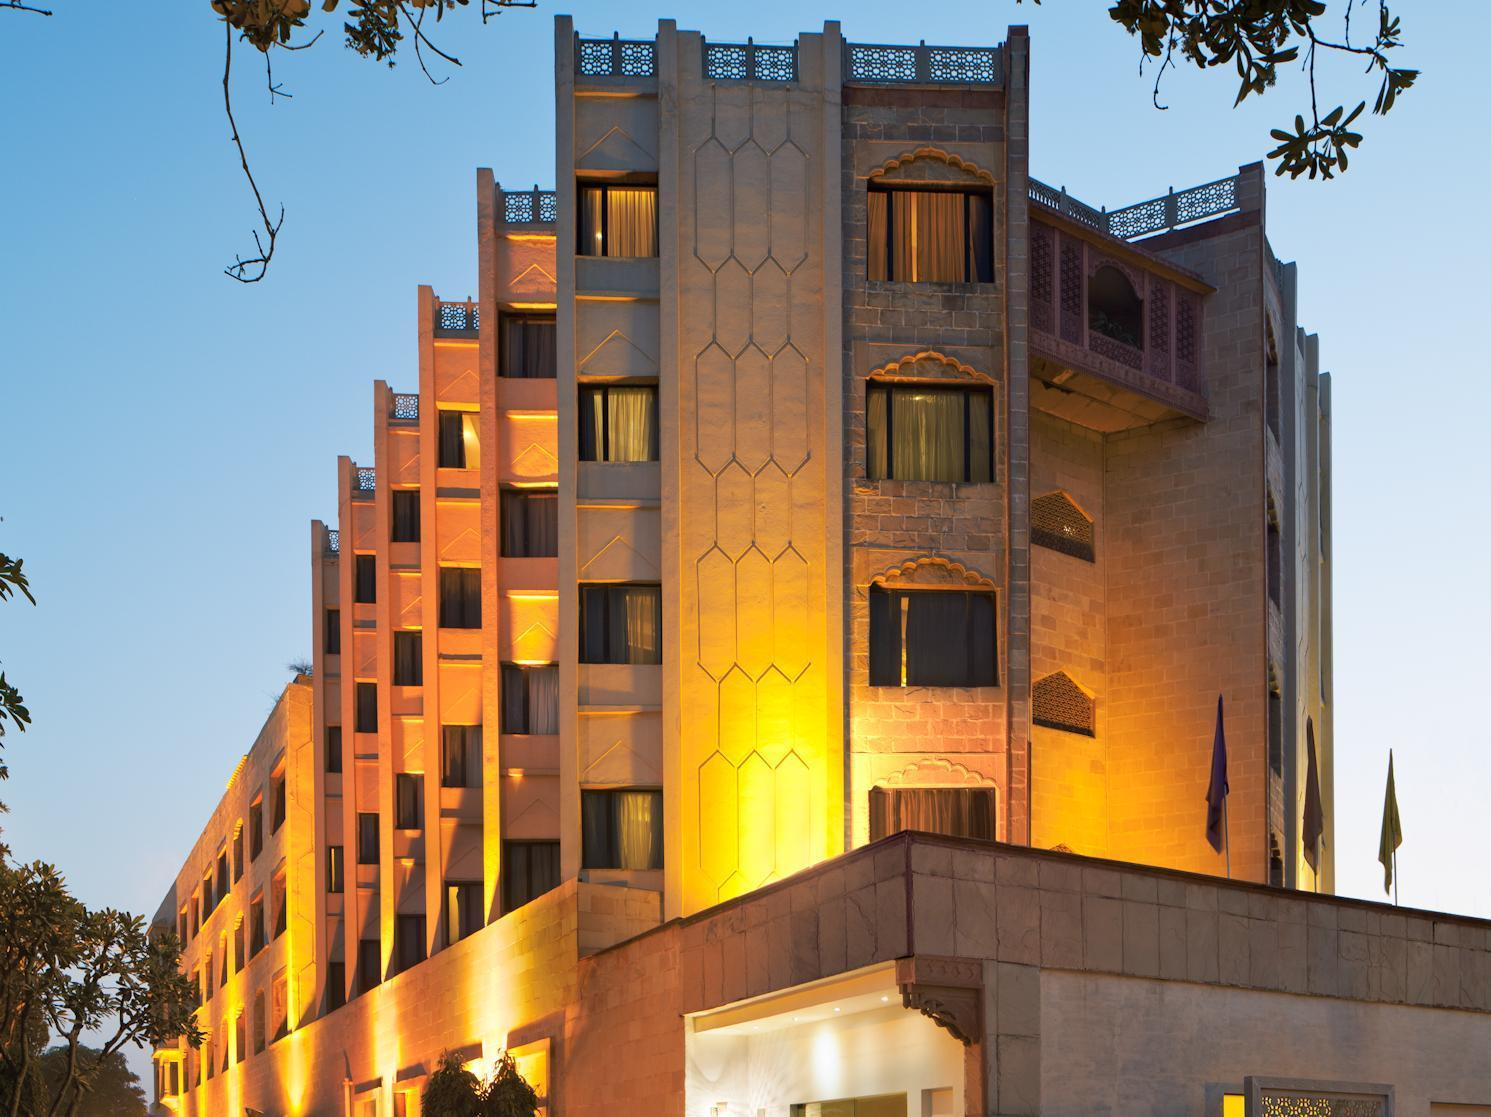 Mansingh Palace Hotel Agra - Agra